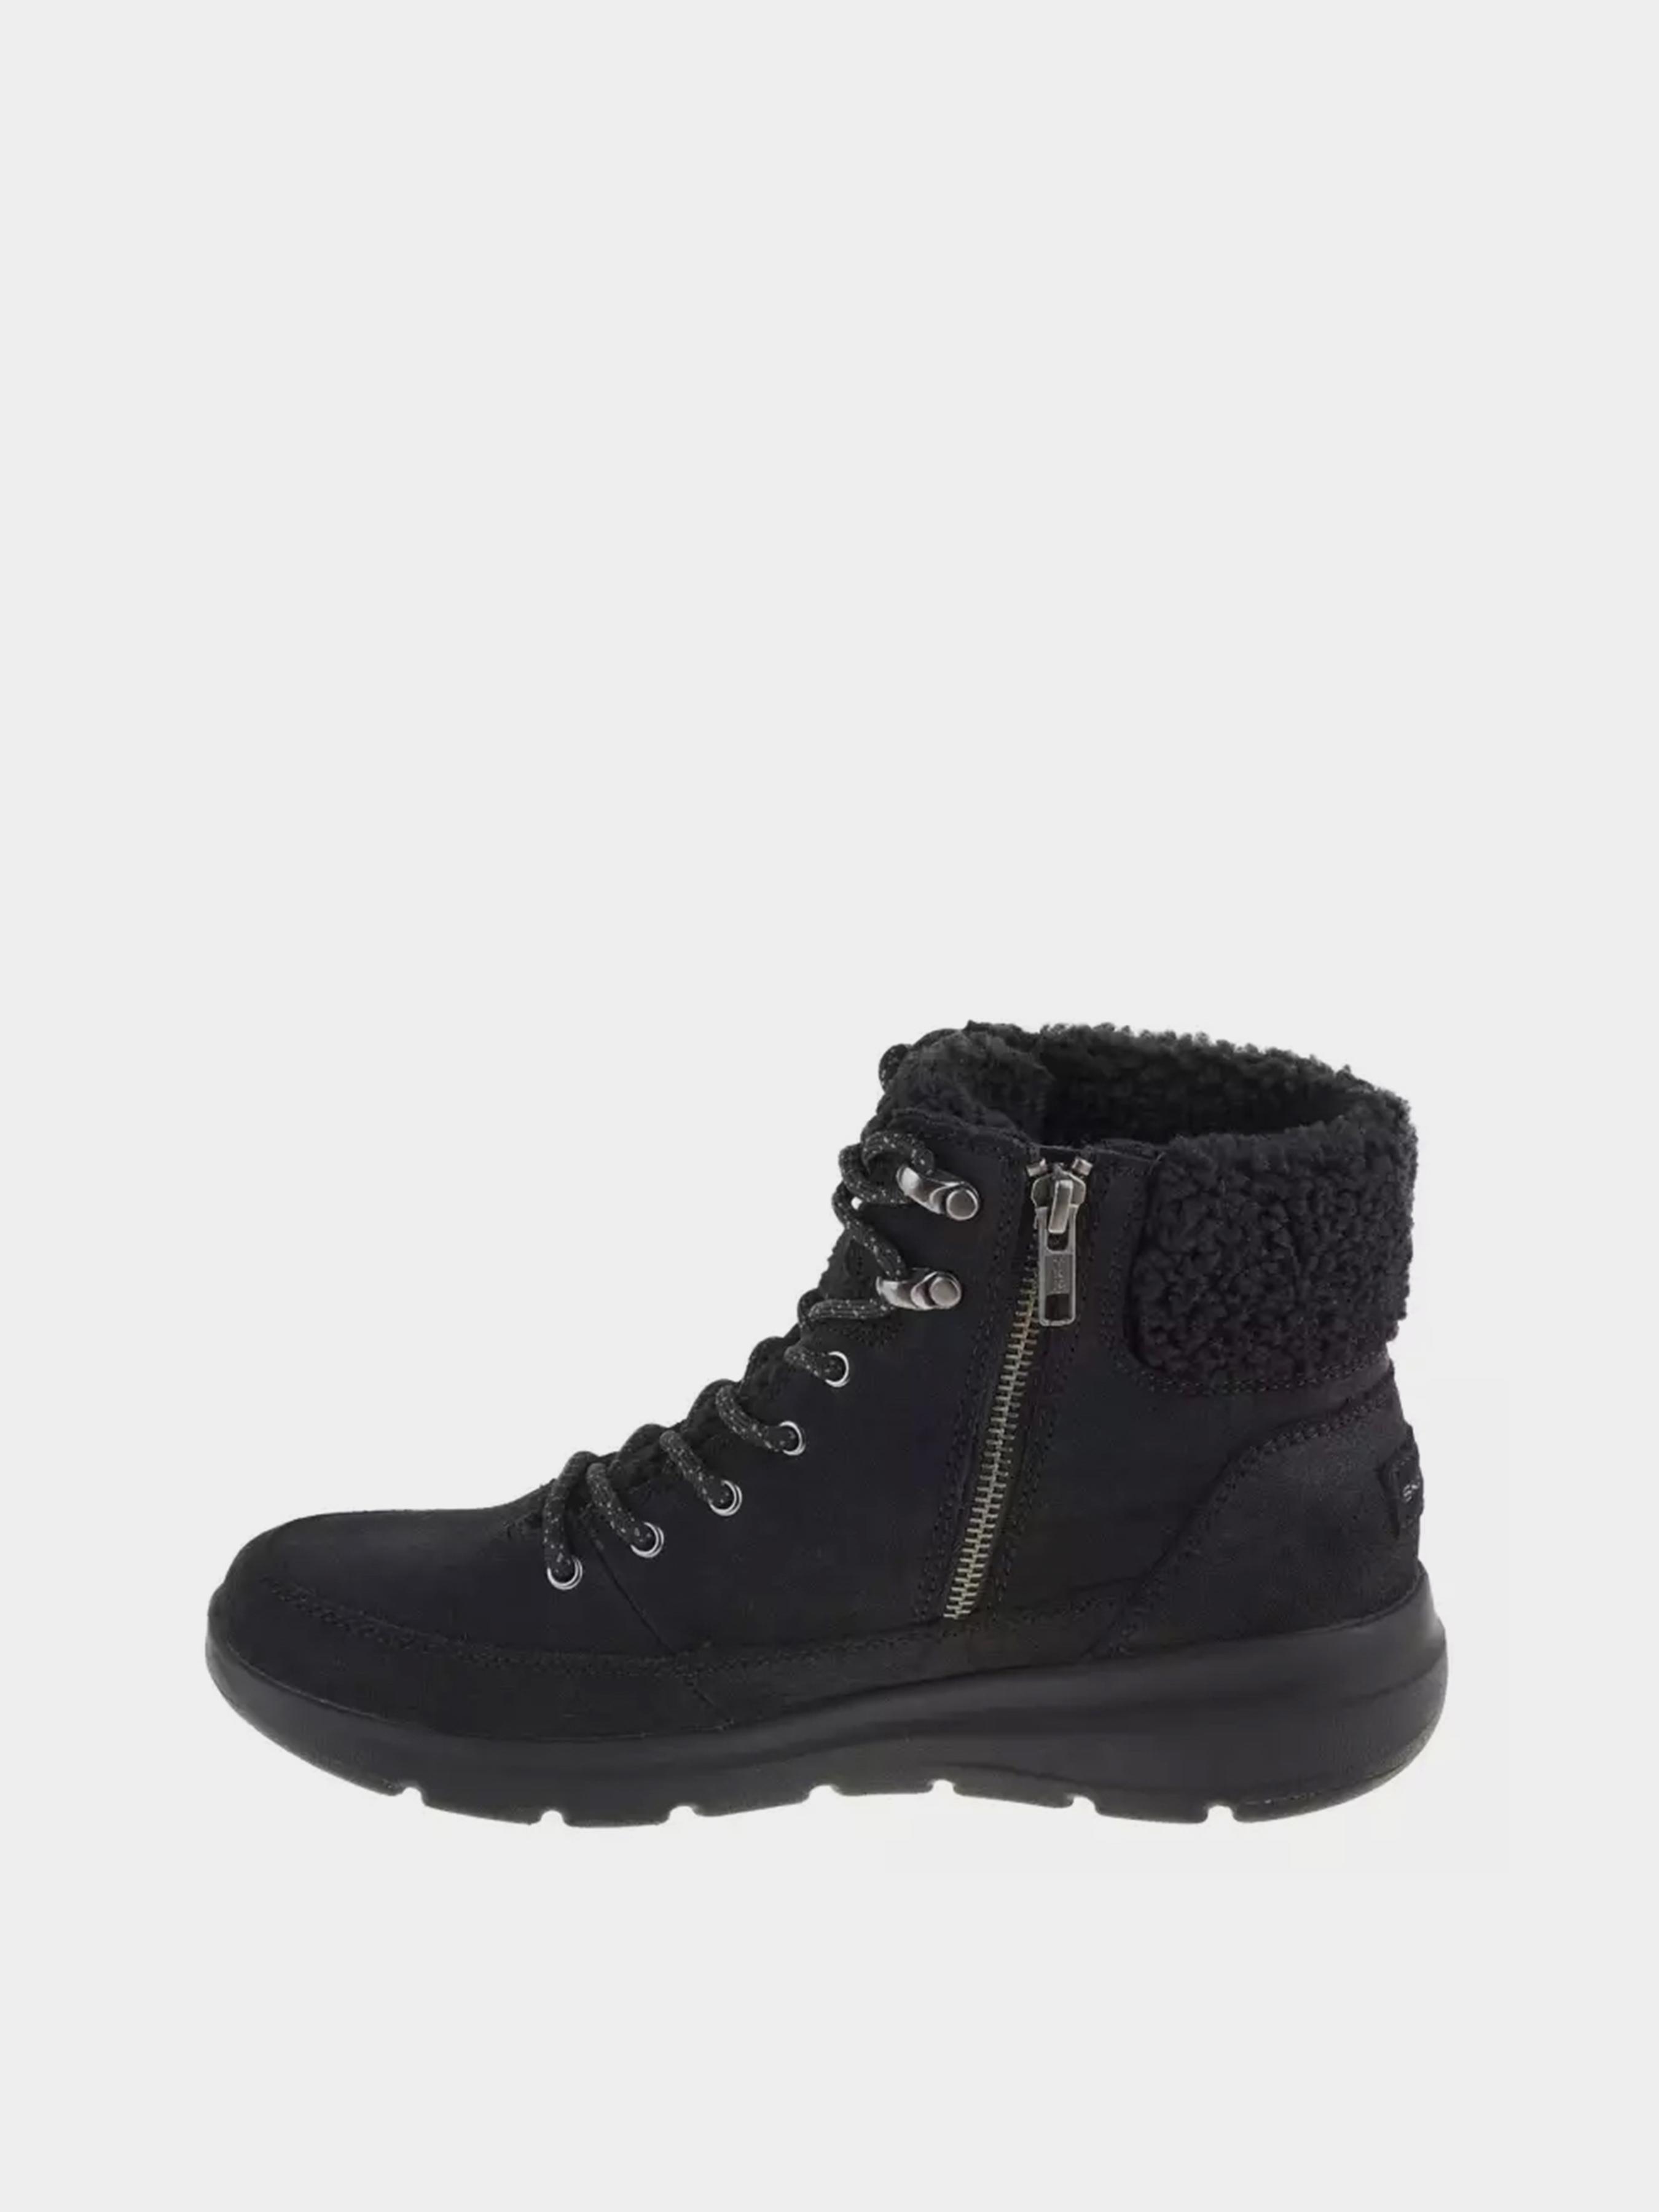 Ботинки для женщин Skechers KW5299 размеры обуви, 2017